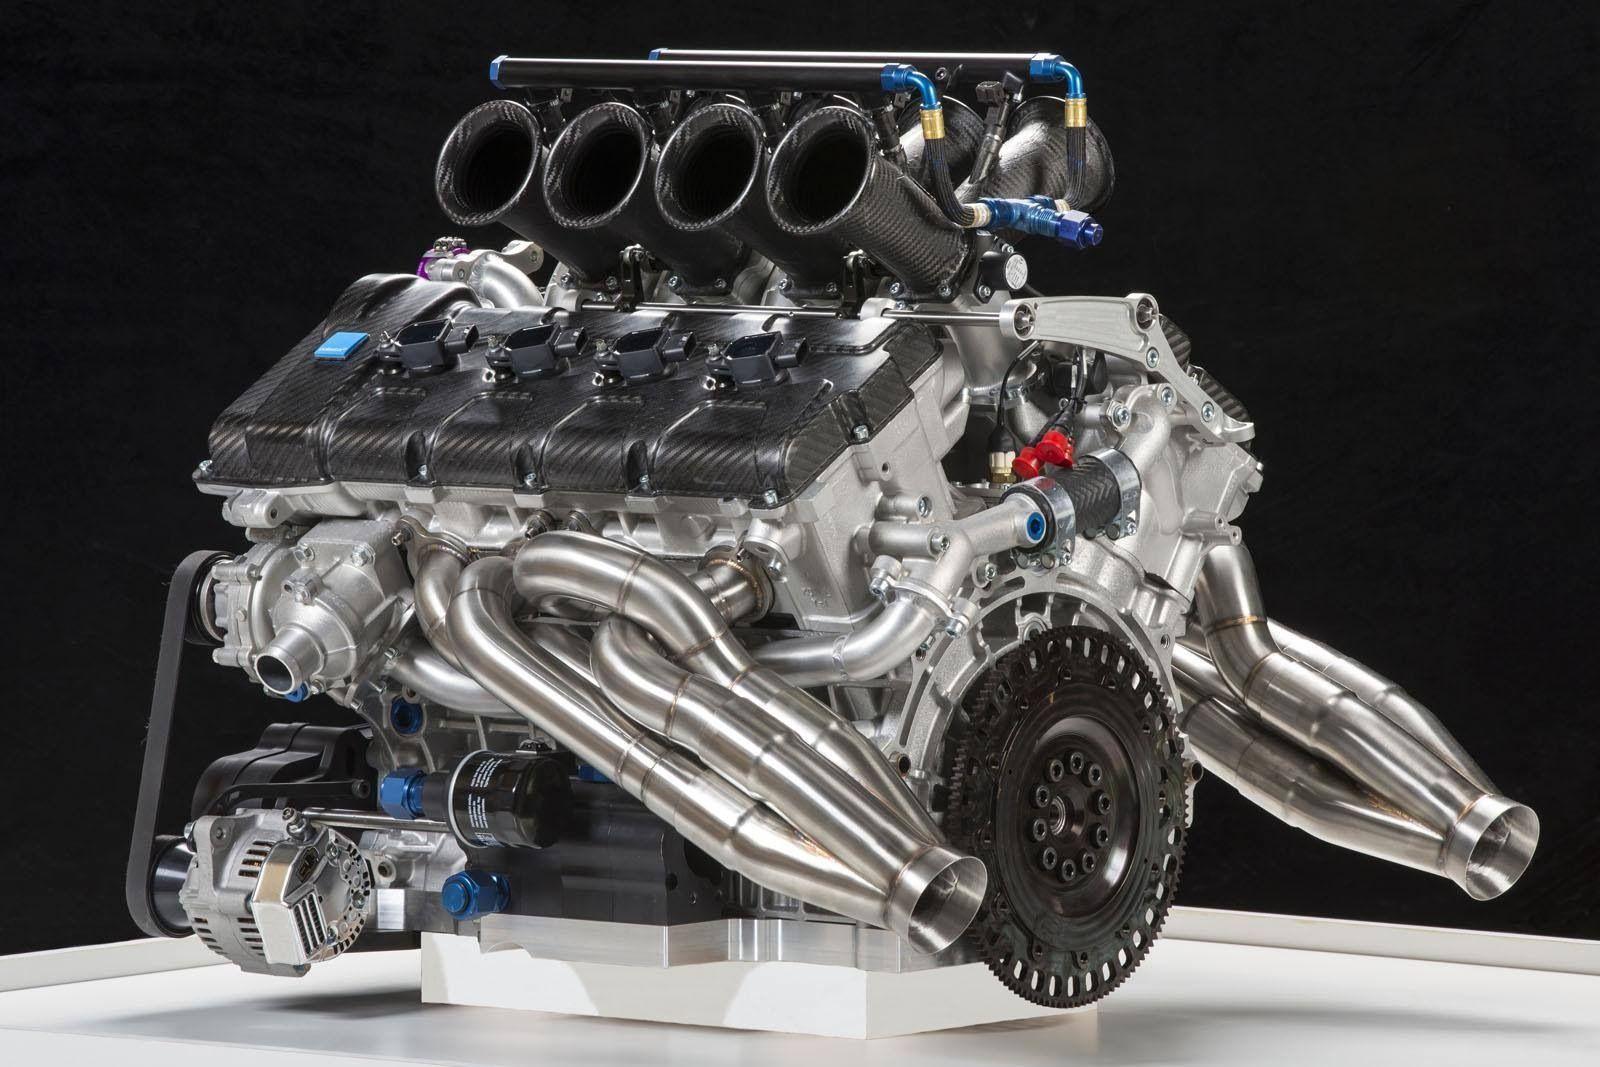 Polestar Shows Off The V8 Going Racing In Volvo S60s In Australia Supercar Engine Volvo Super Cars